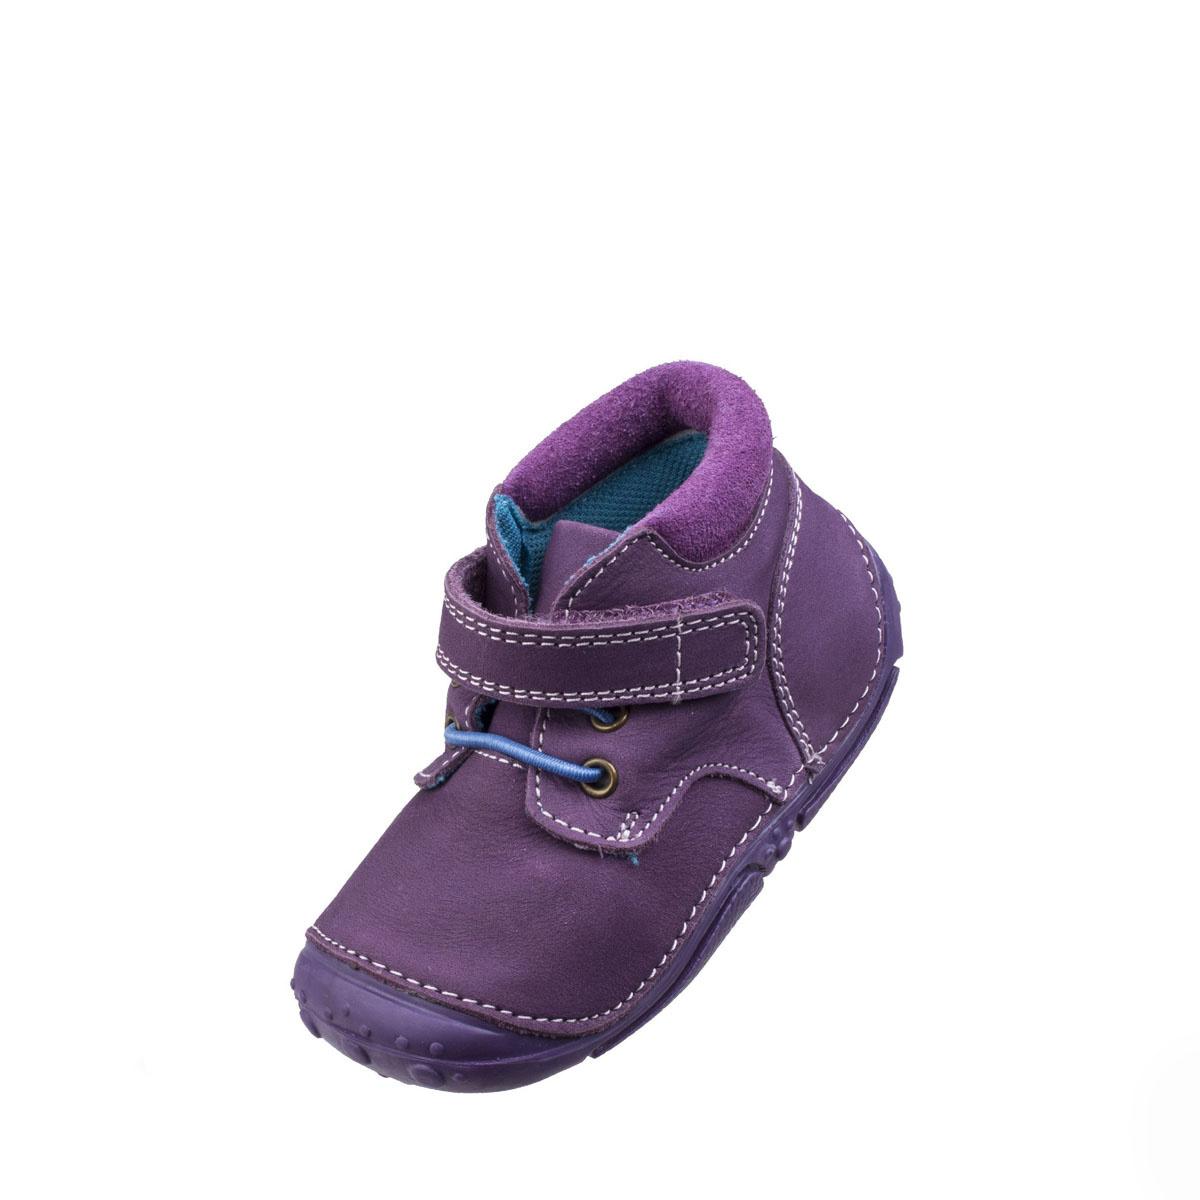 Hush Puppies Lily Purple